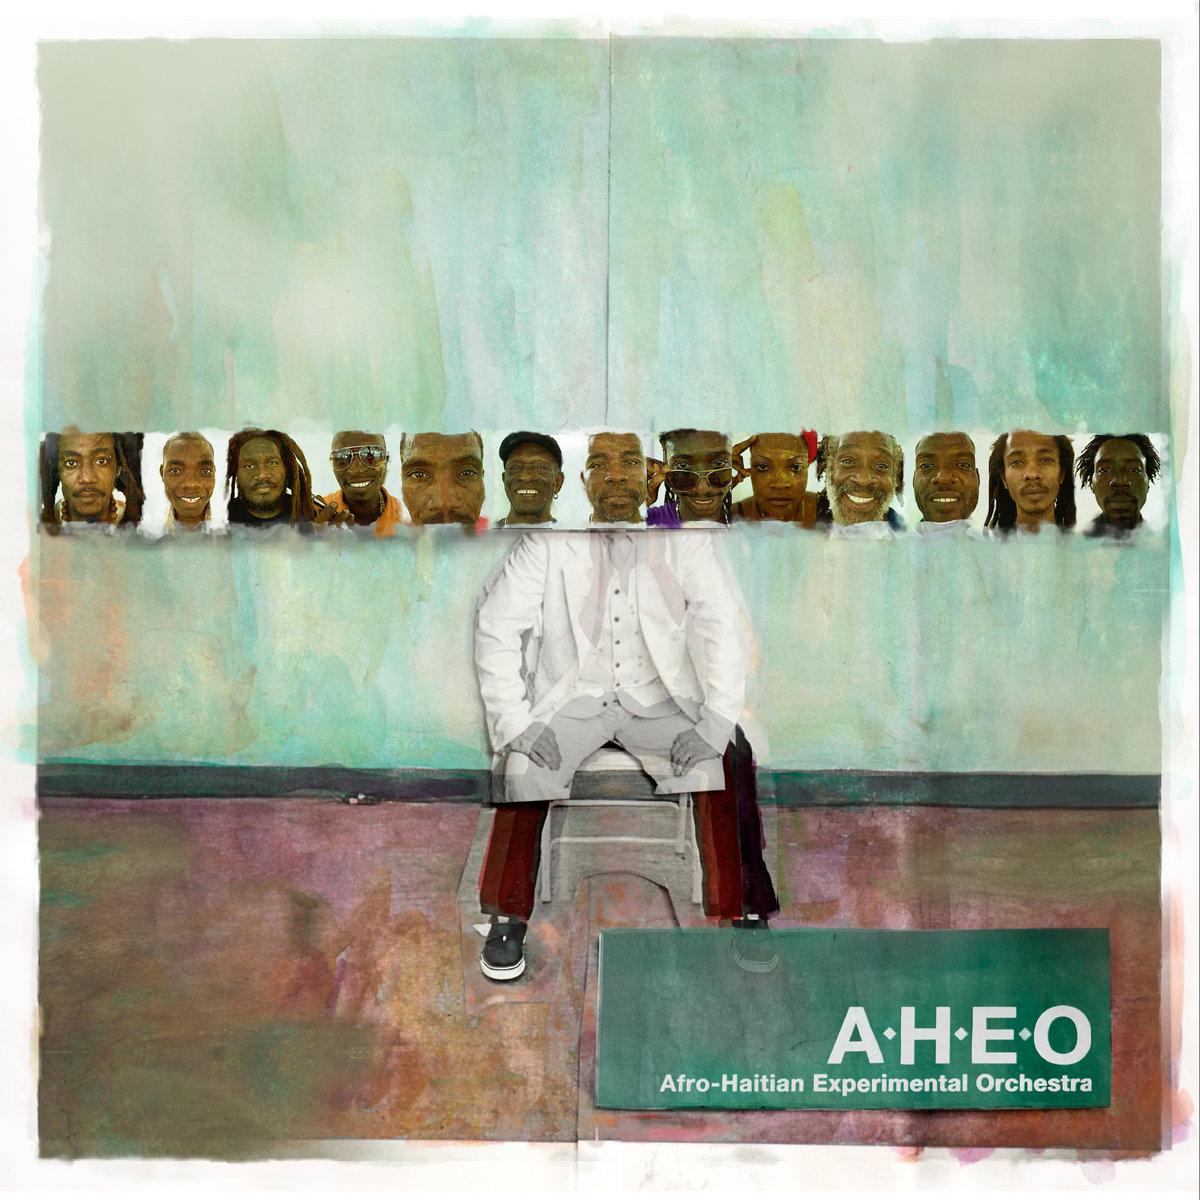 e4adcfd73 Afro-Haitian Experimental Orchestra | Afro-Haitian Experimental ...